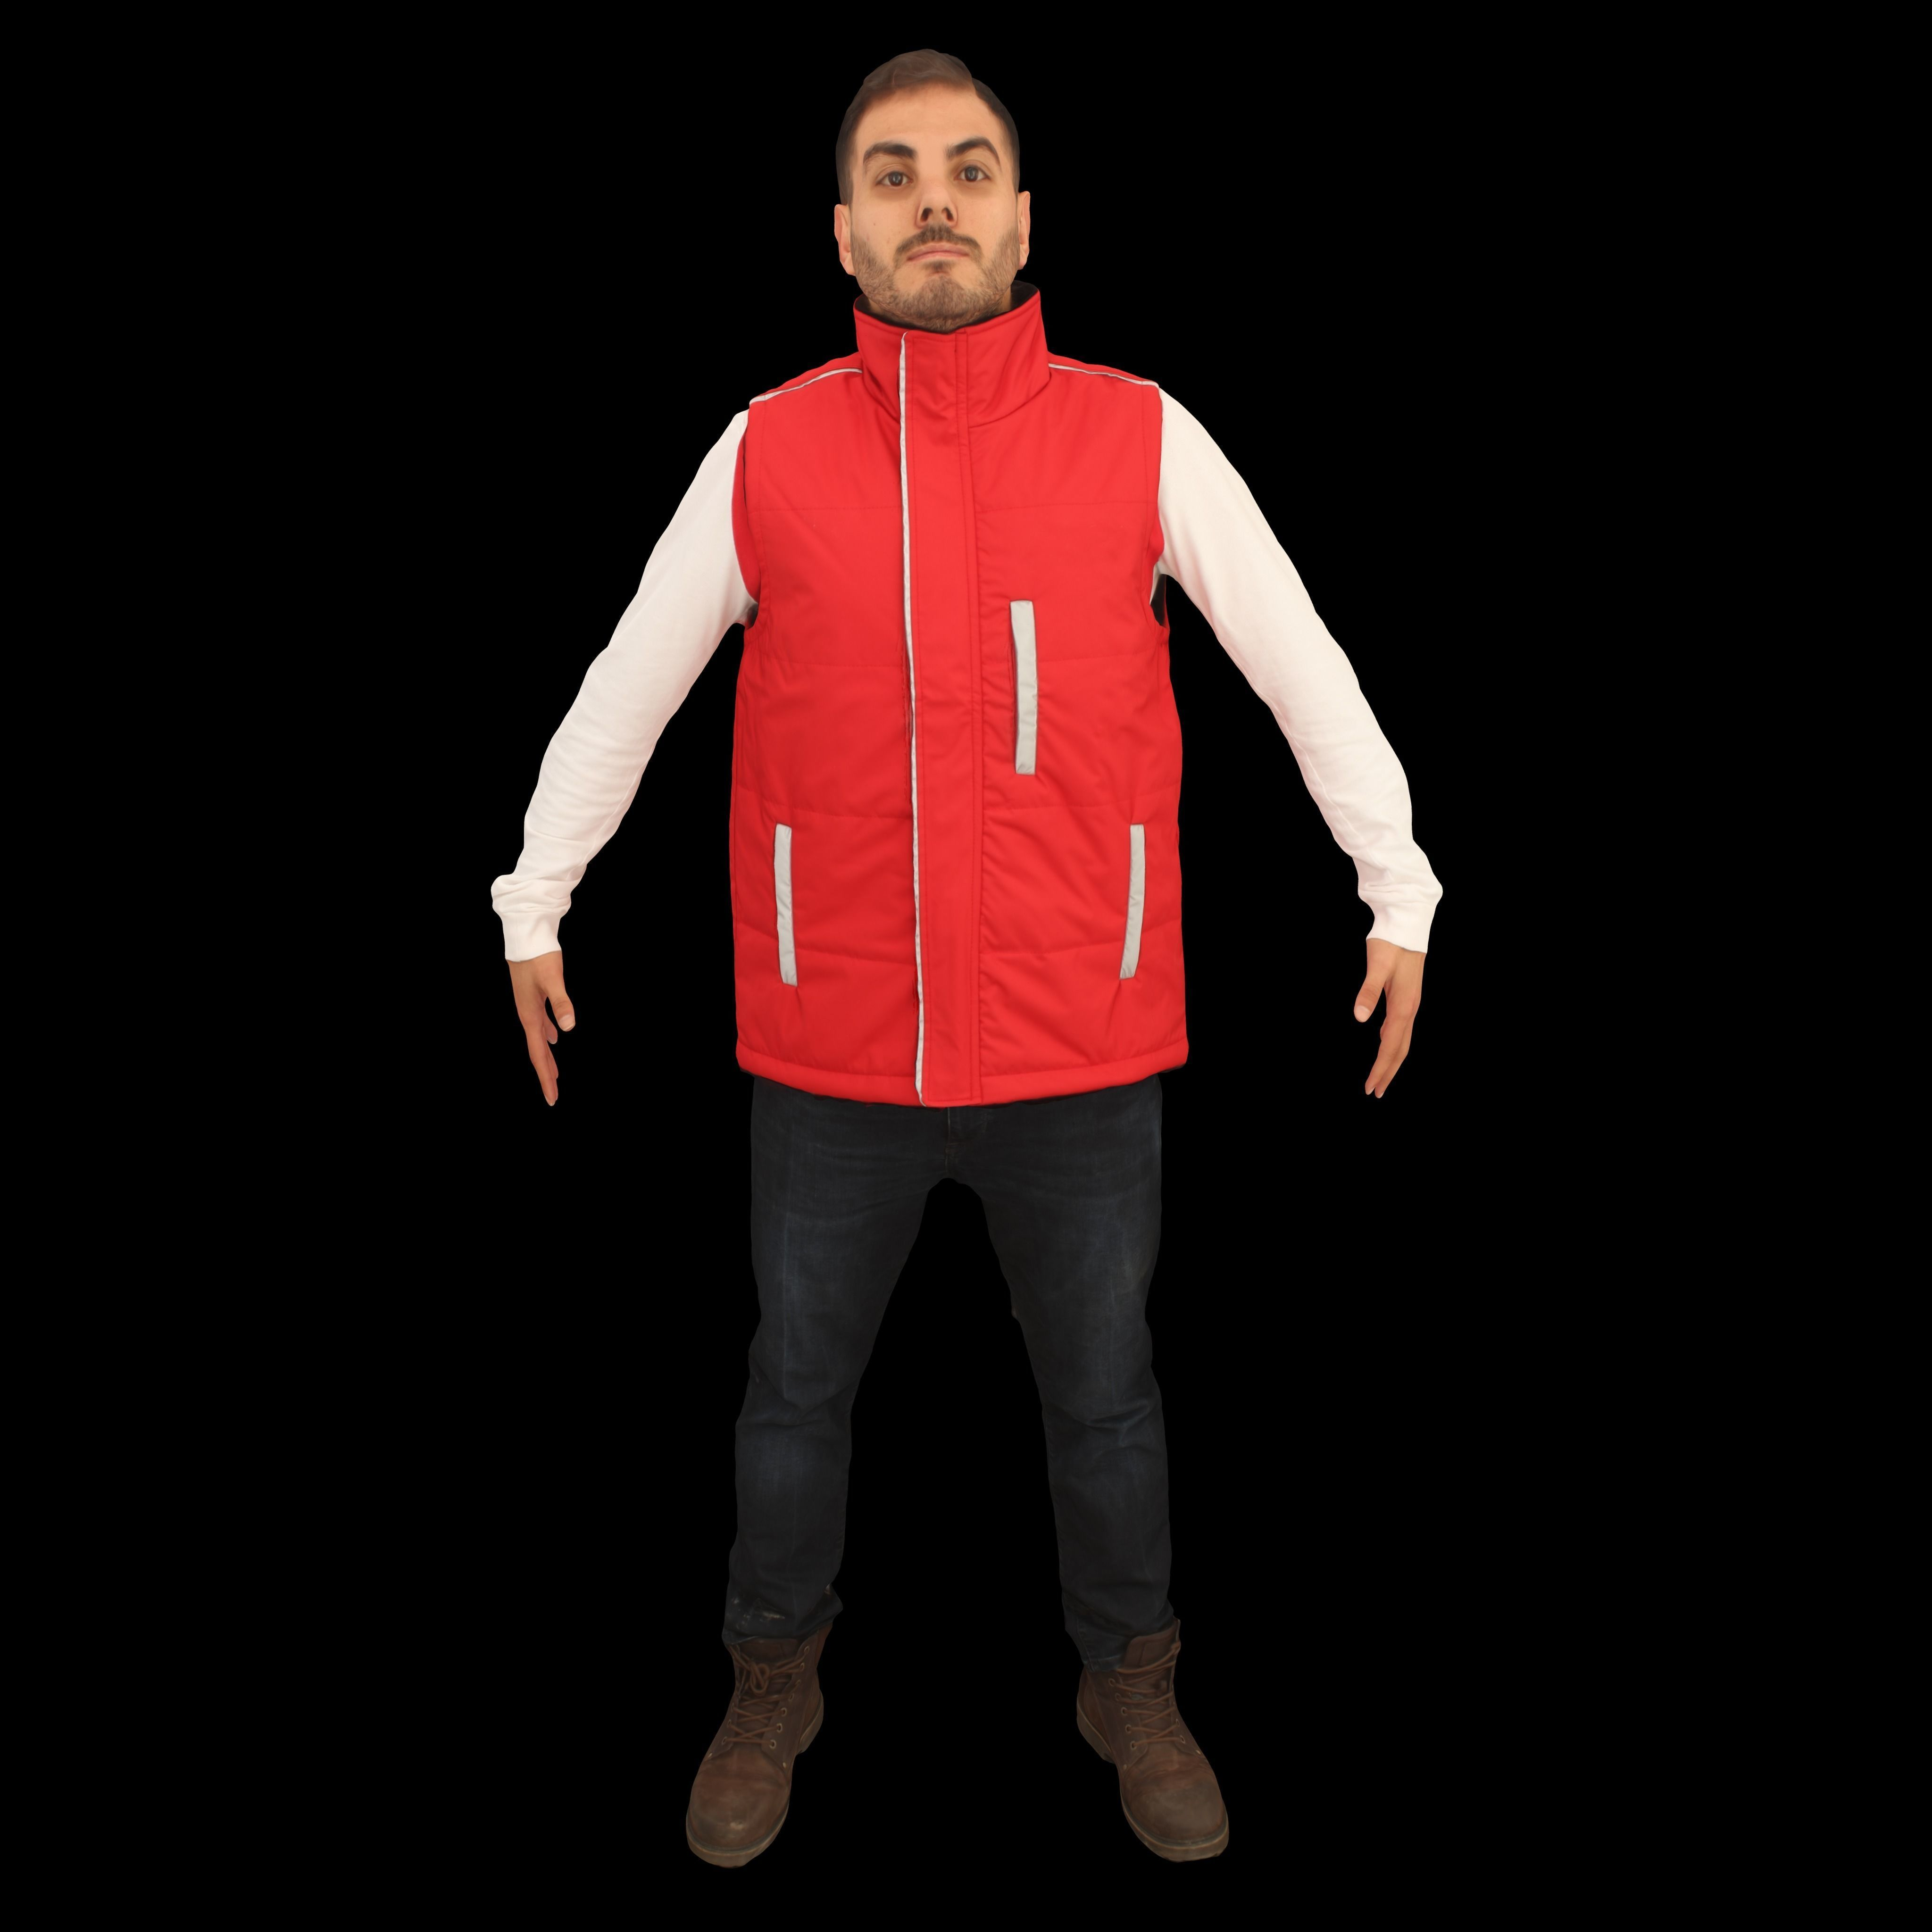 No447 - Male Red Vest A Pose